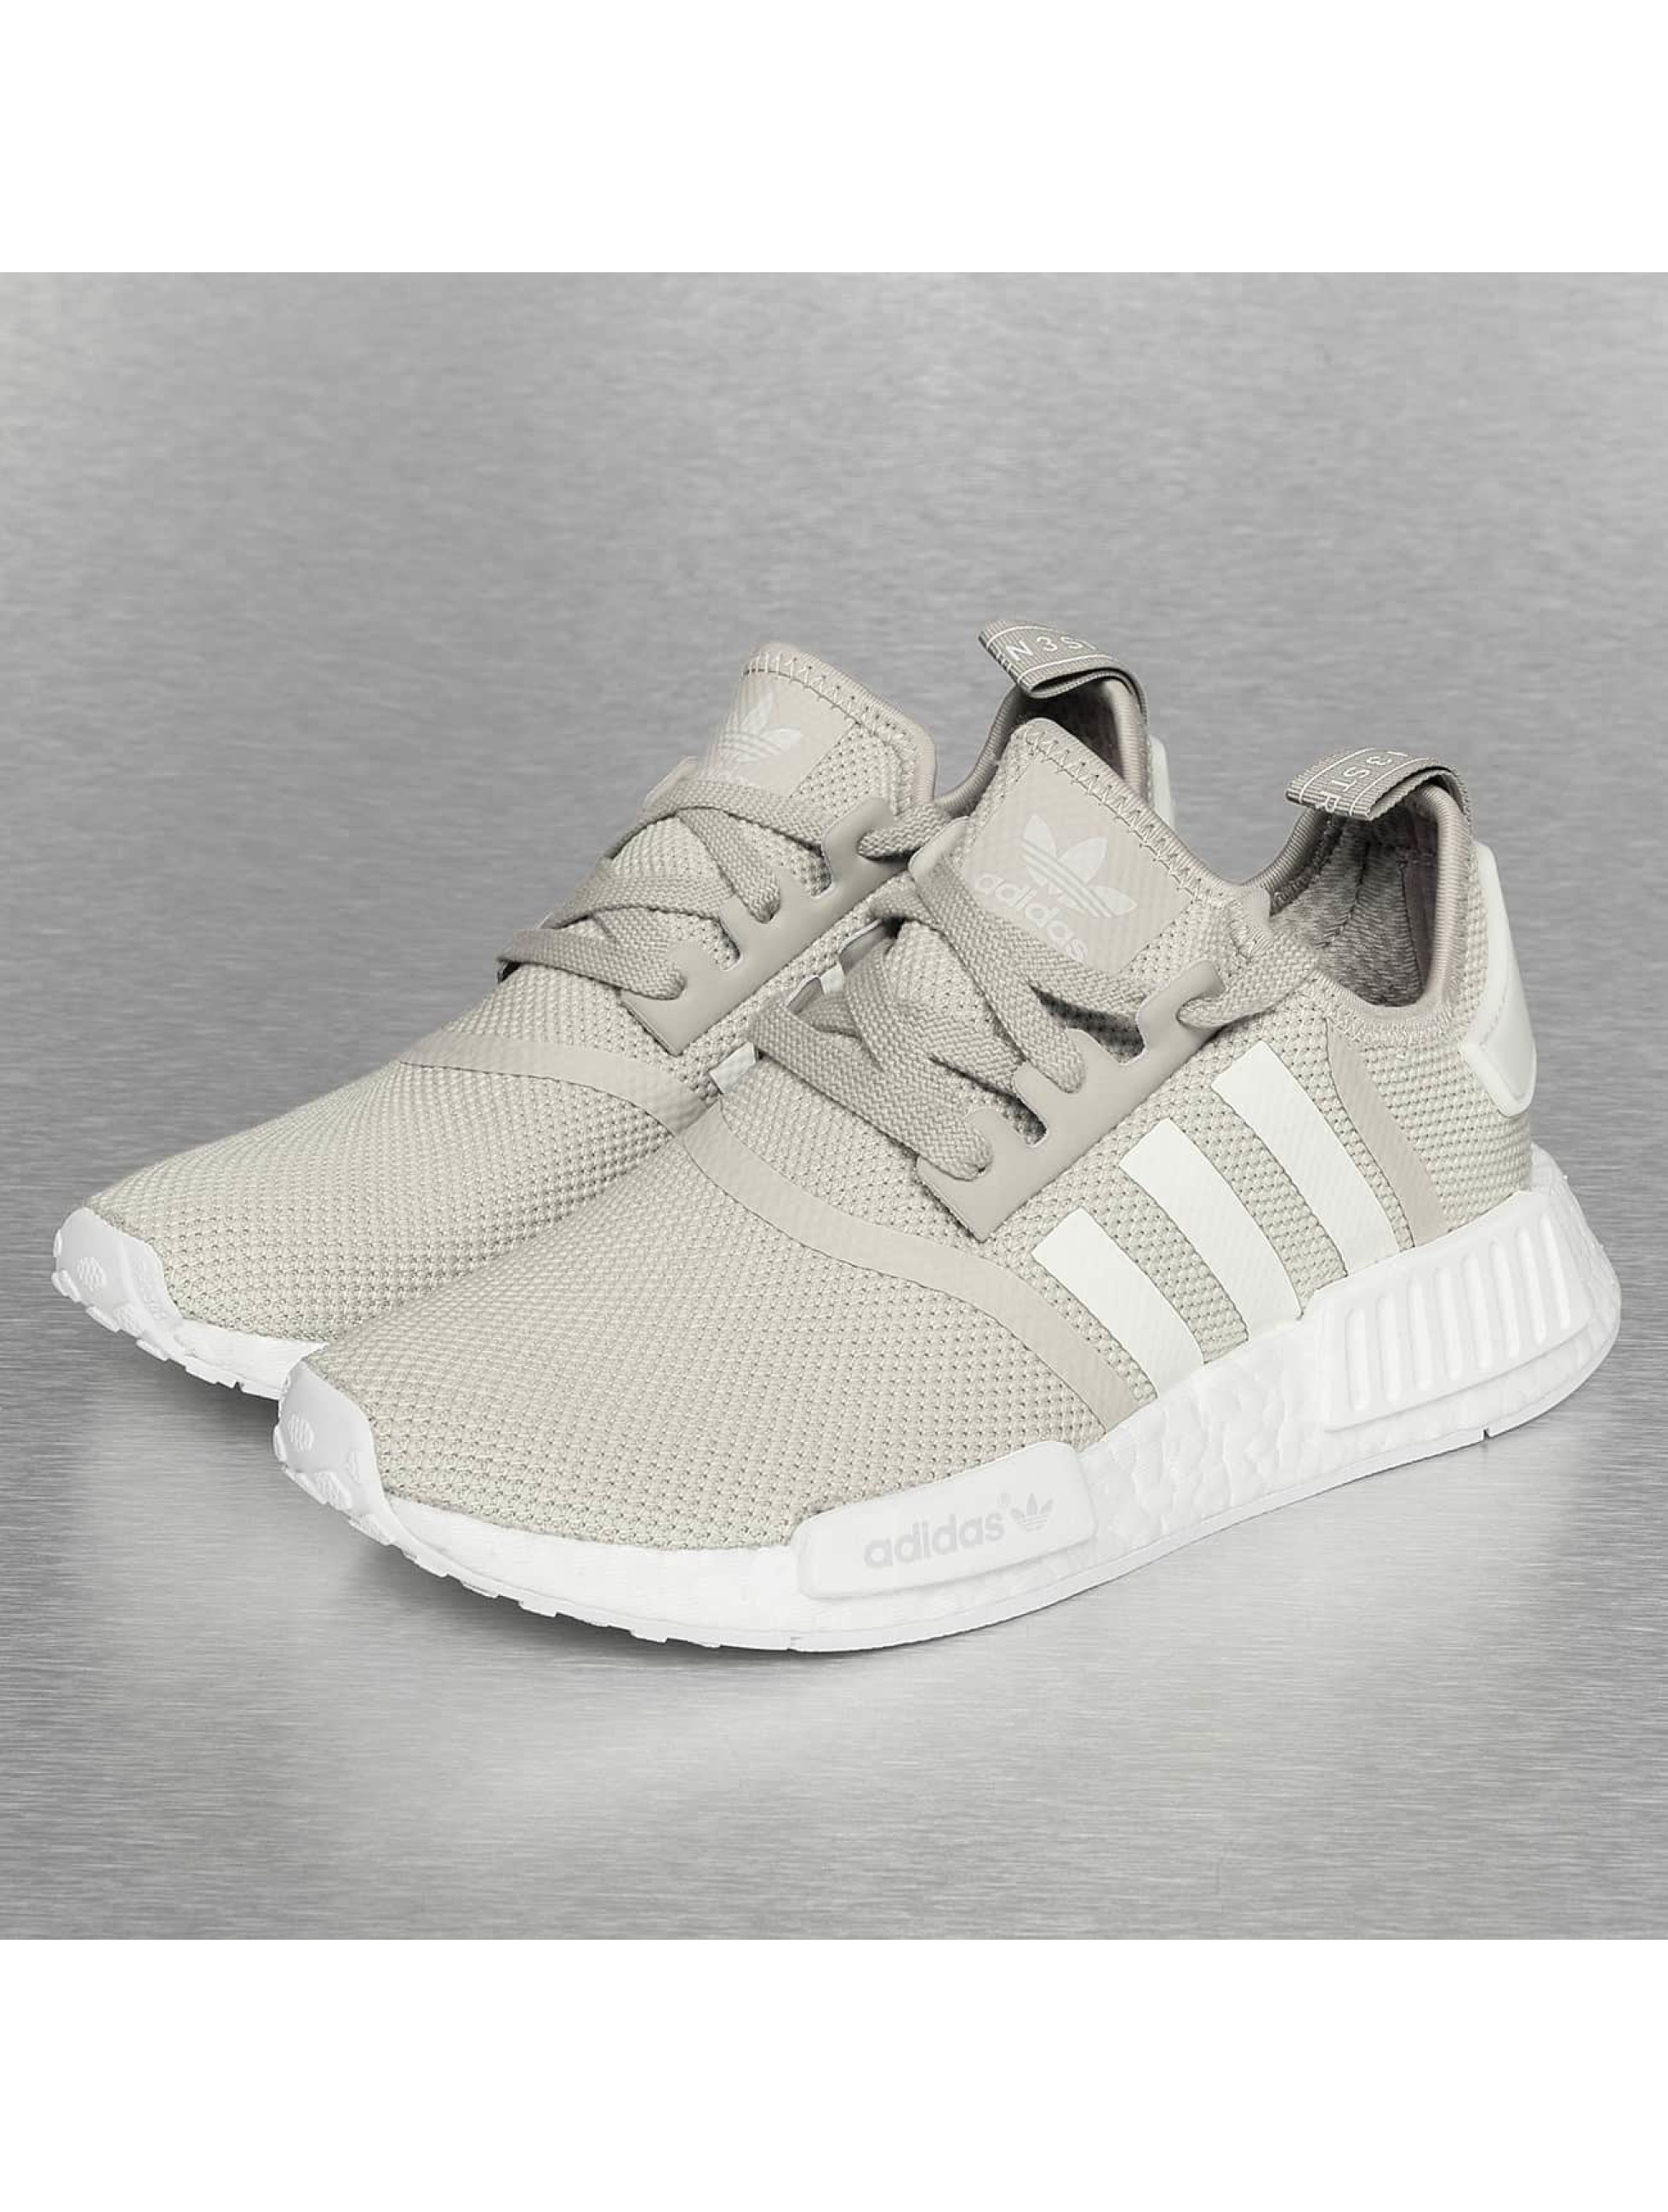 adidas nmd r1 noir et beige